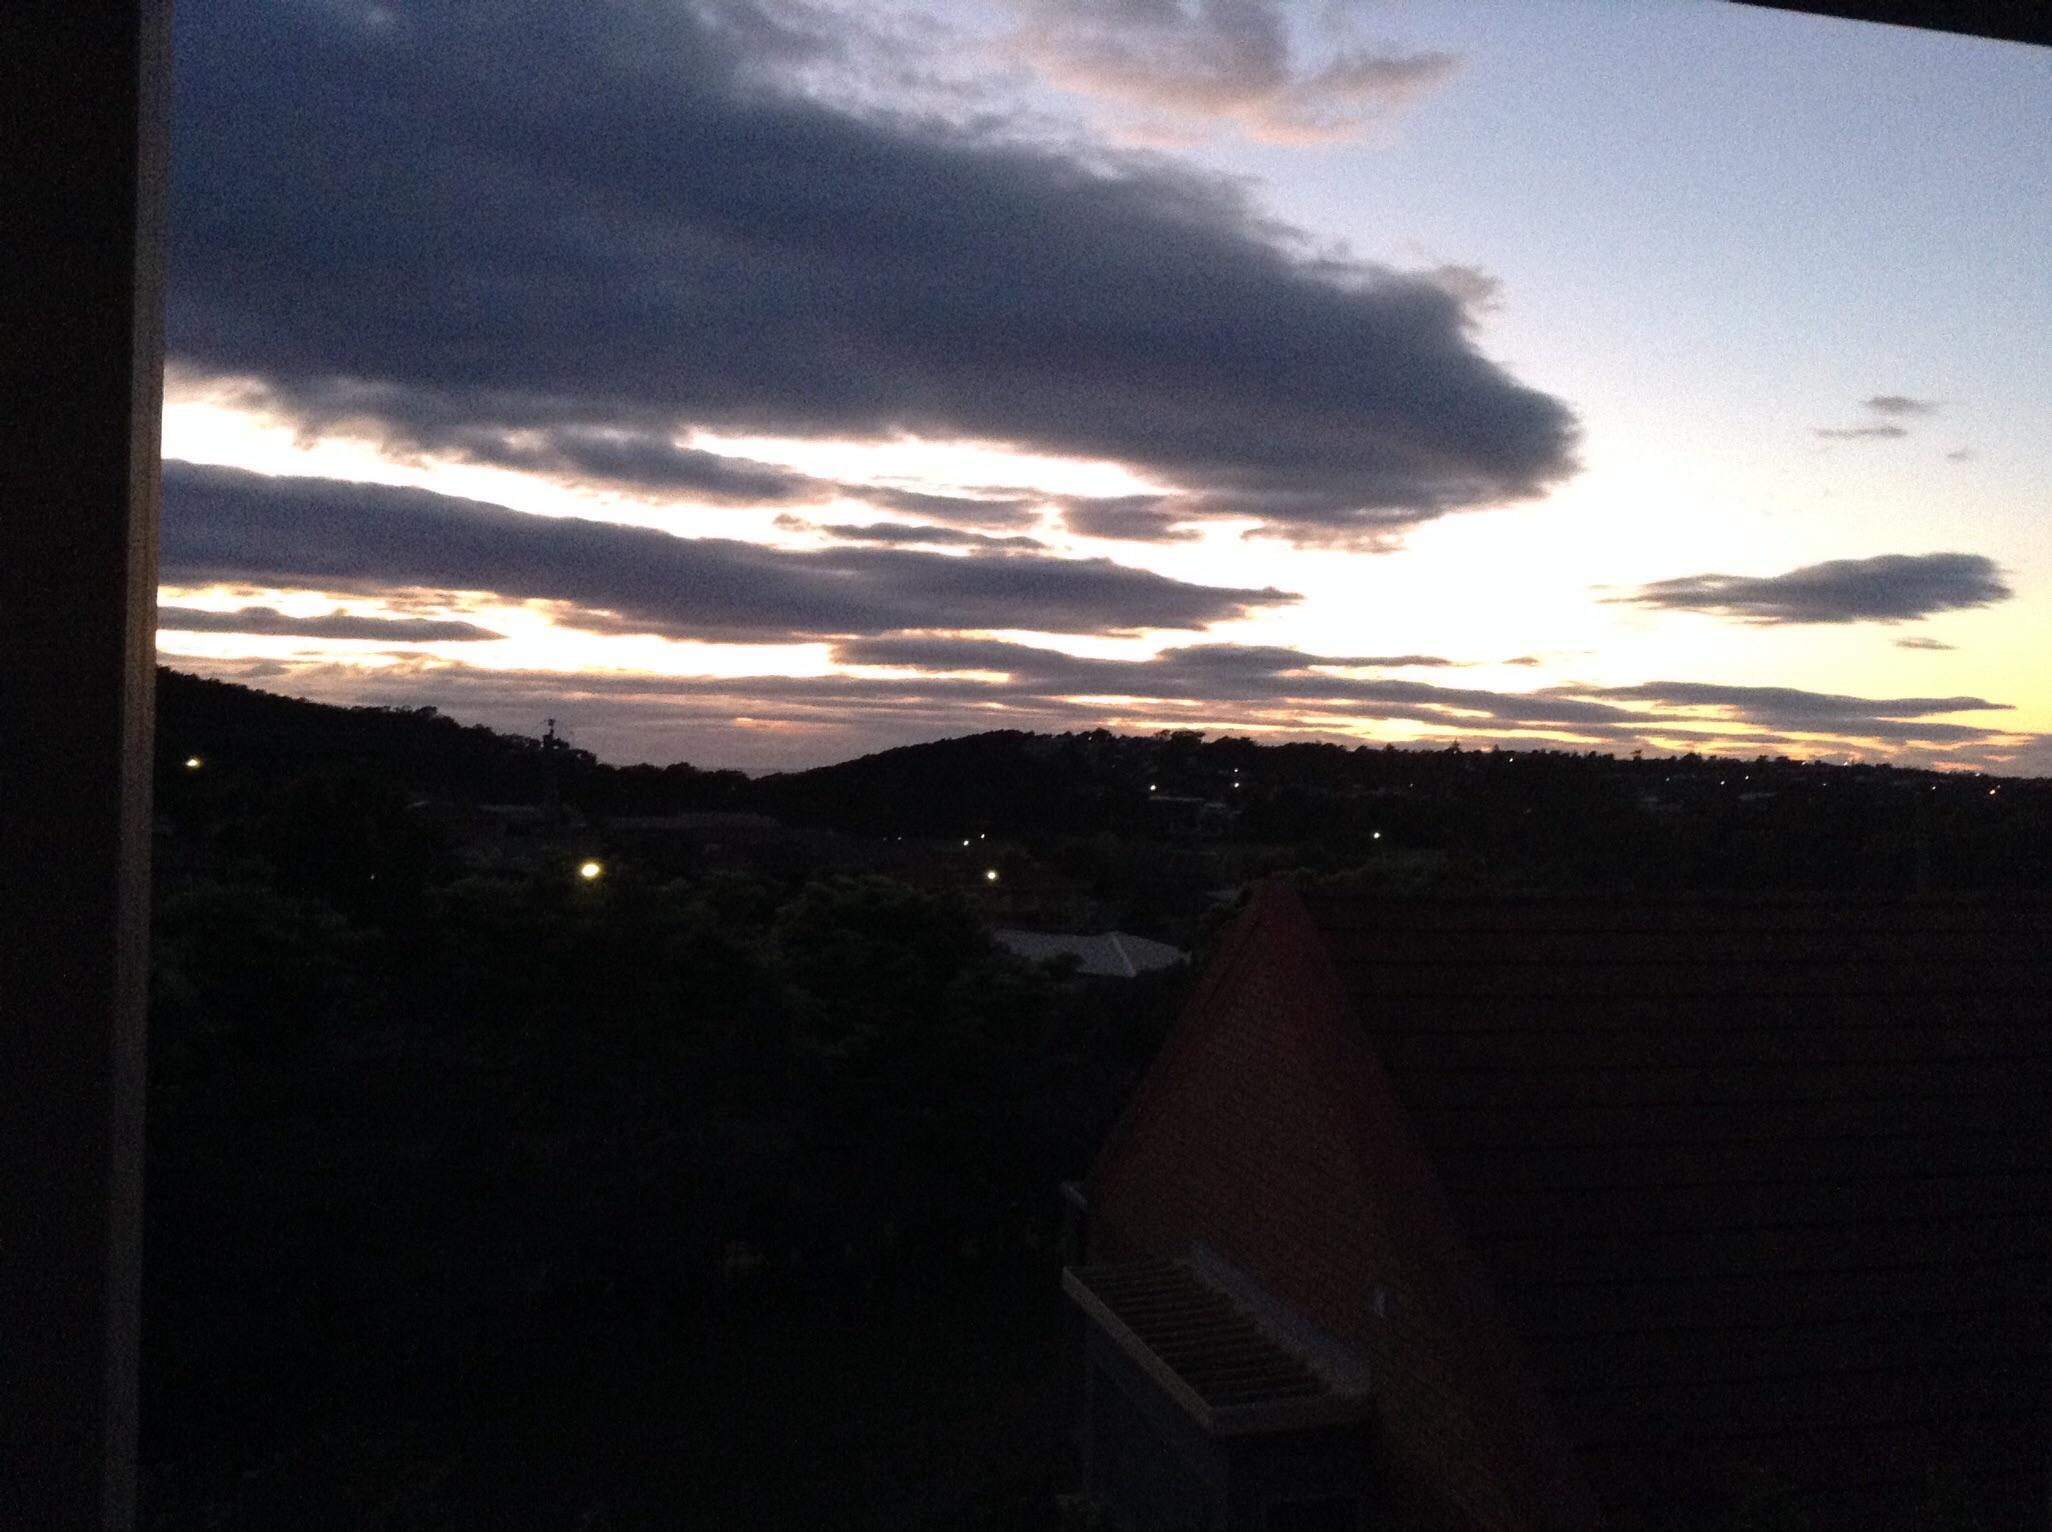 Light of dawn over the coast line